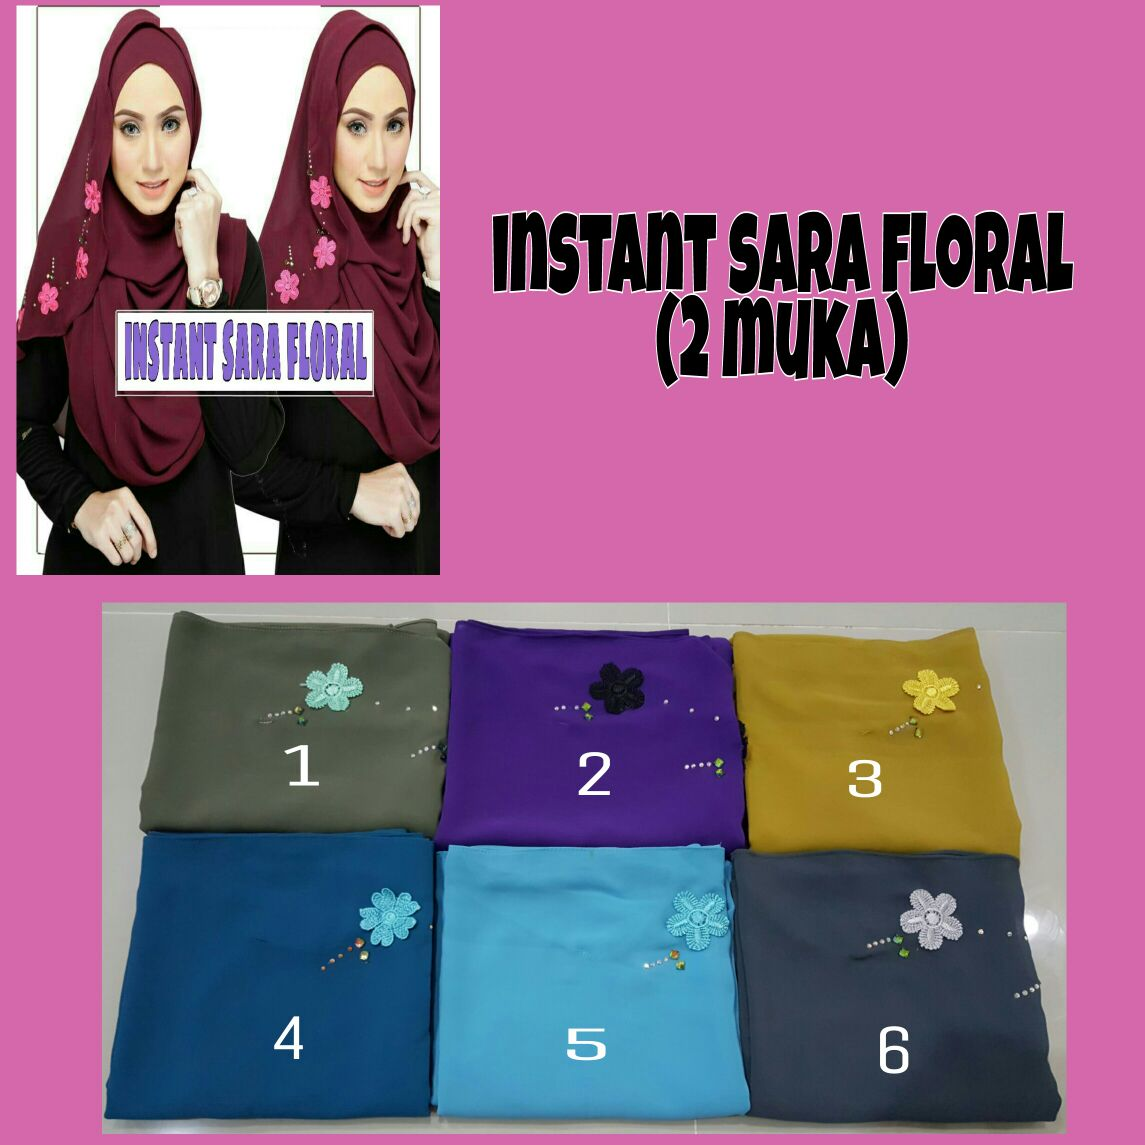 Instant Sara Floral (2 muka)